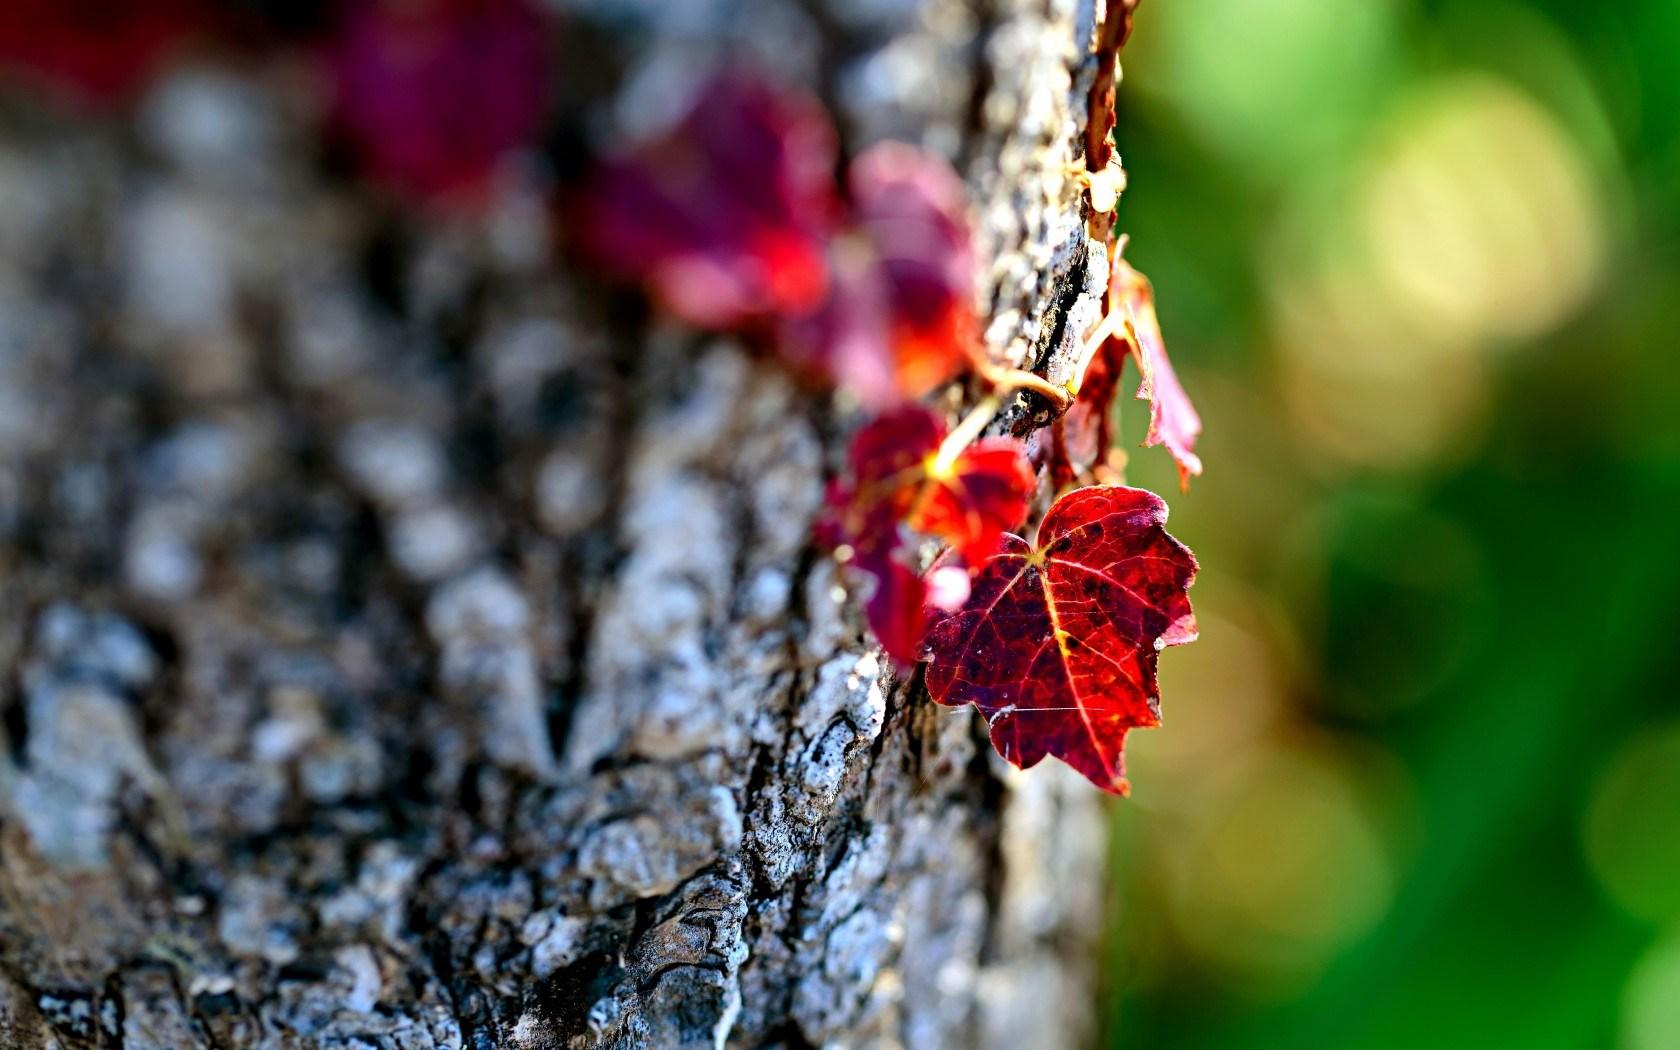 Fall Season Computer Wallpaper Leaves Picture Photography Hd Desktop Wallpapers 4k Hd